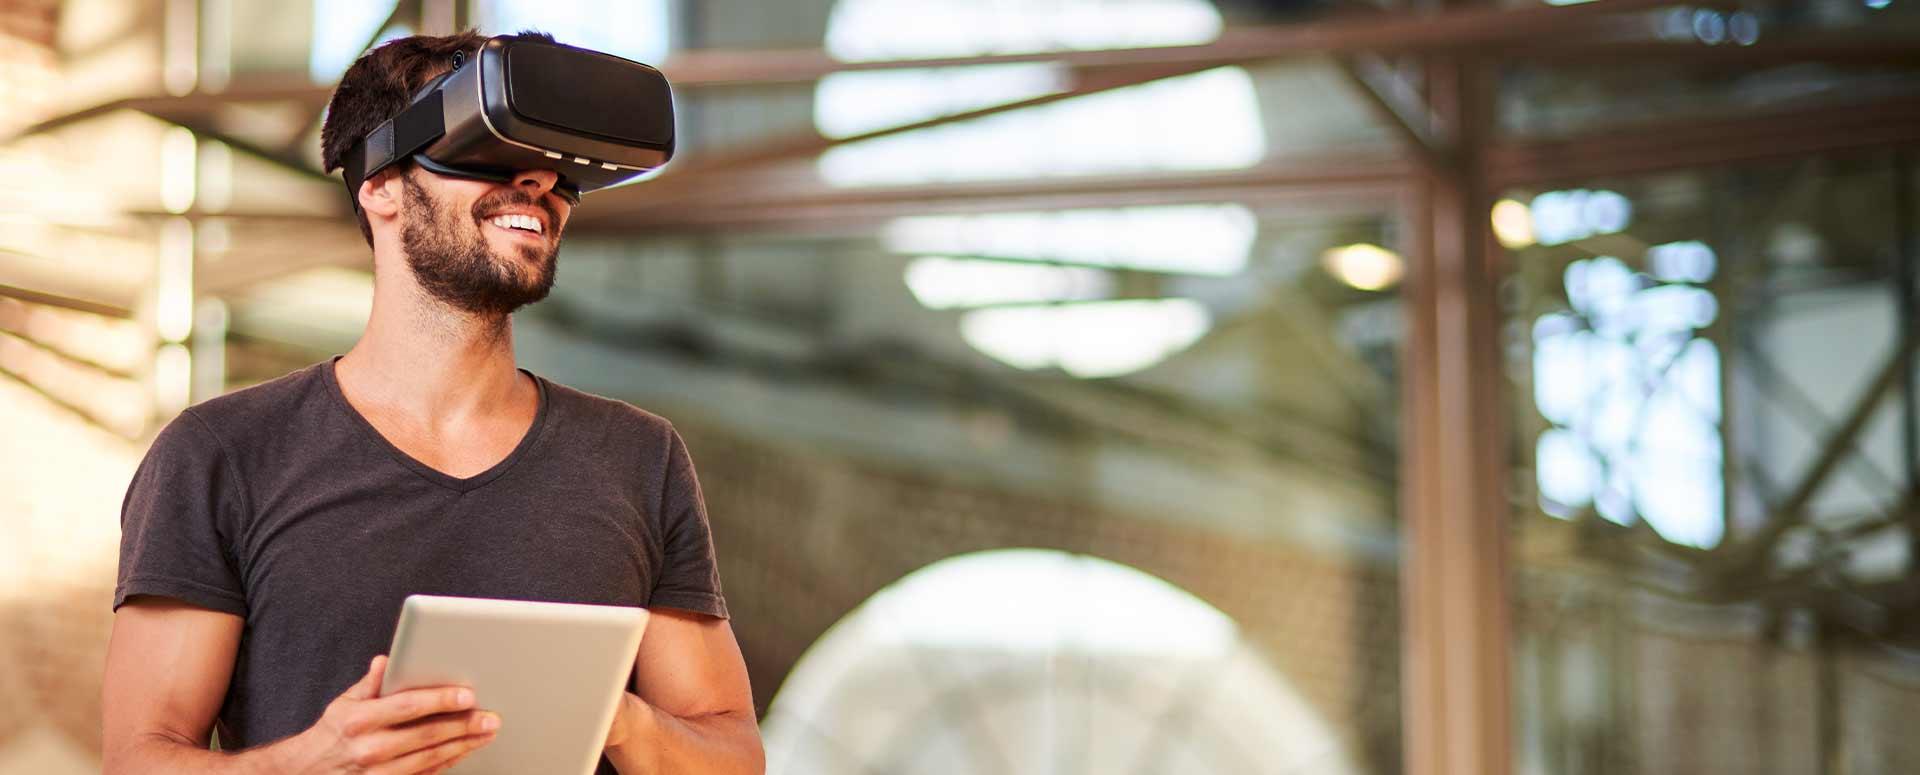 A man wearing a VR gear